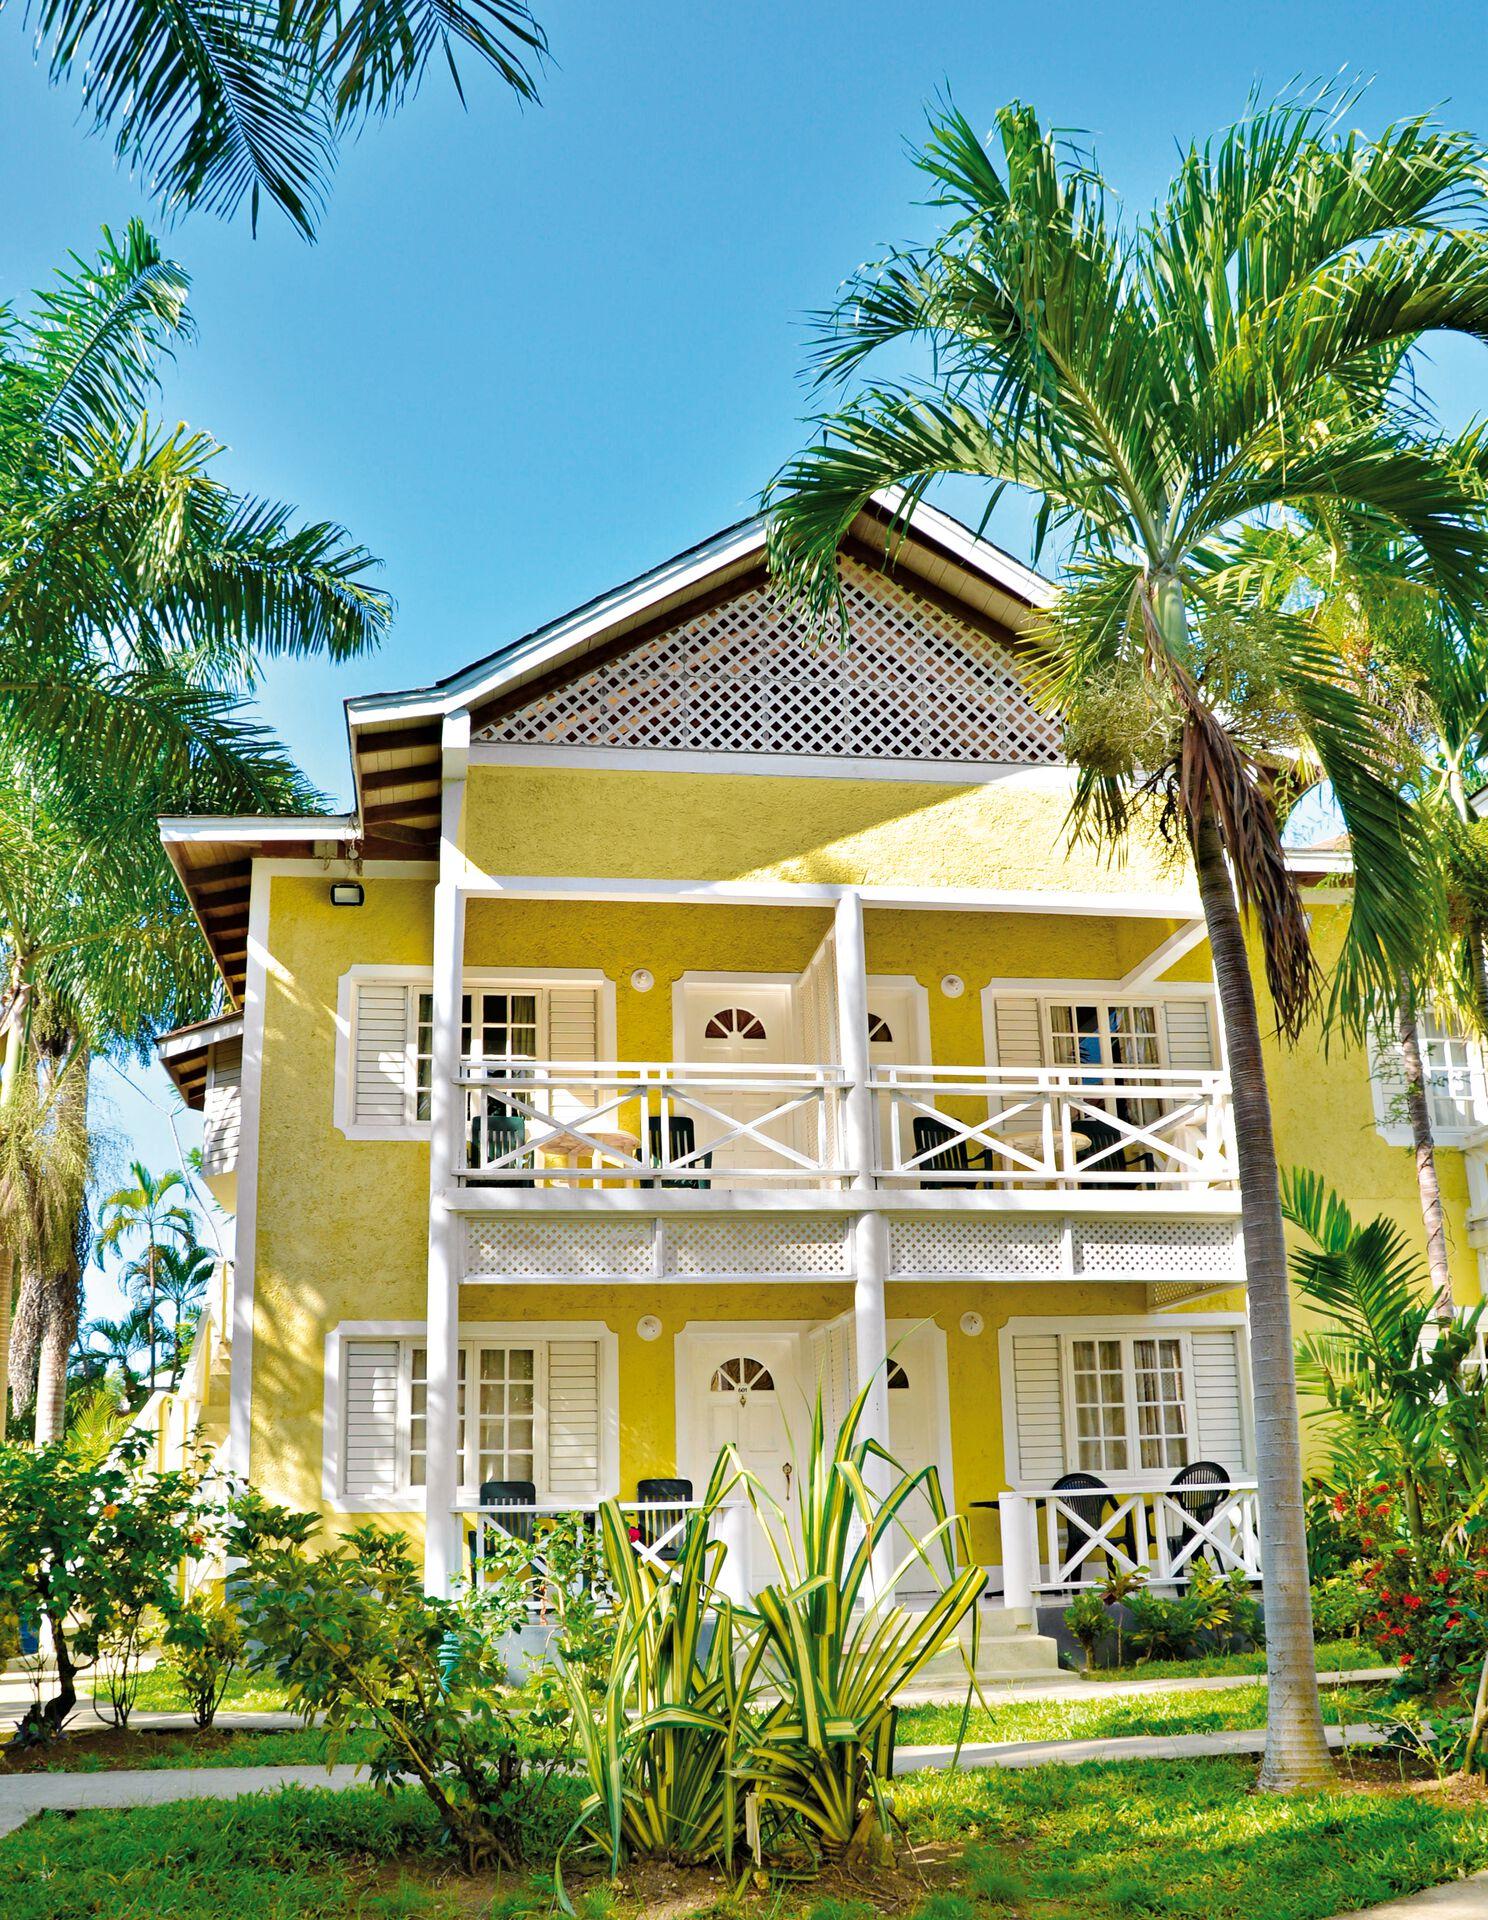 Séjour Jamaïque - Merril's Beach Resort - 3*